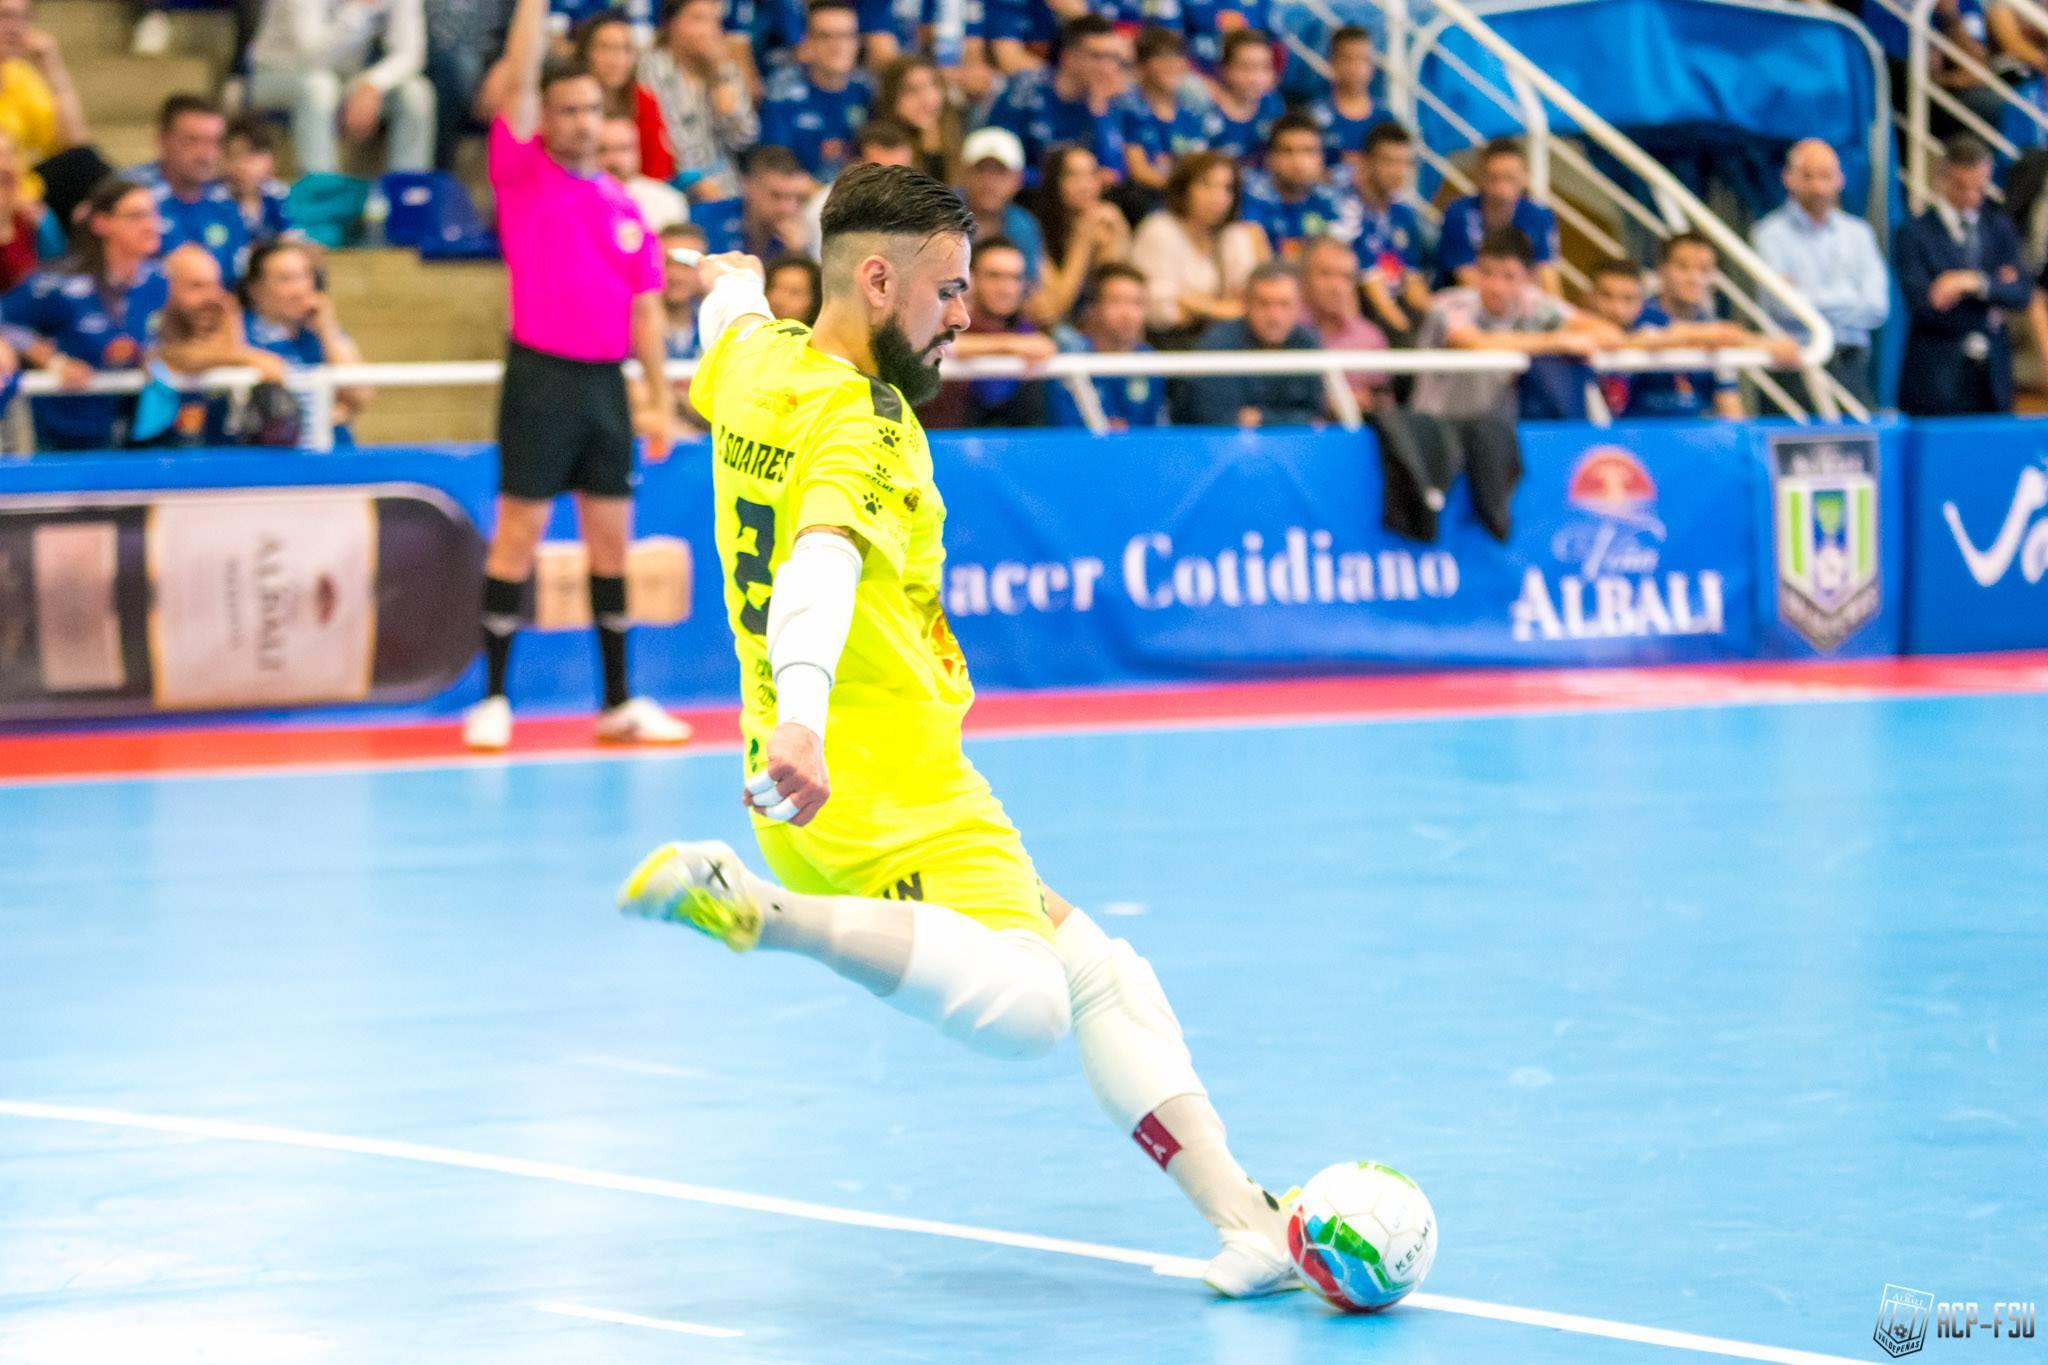 Proneo Sports Futsal - Thiago Soares